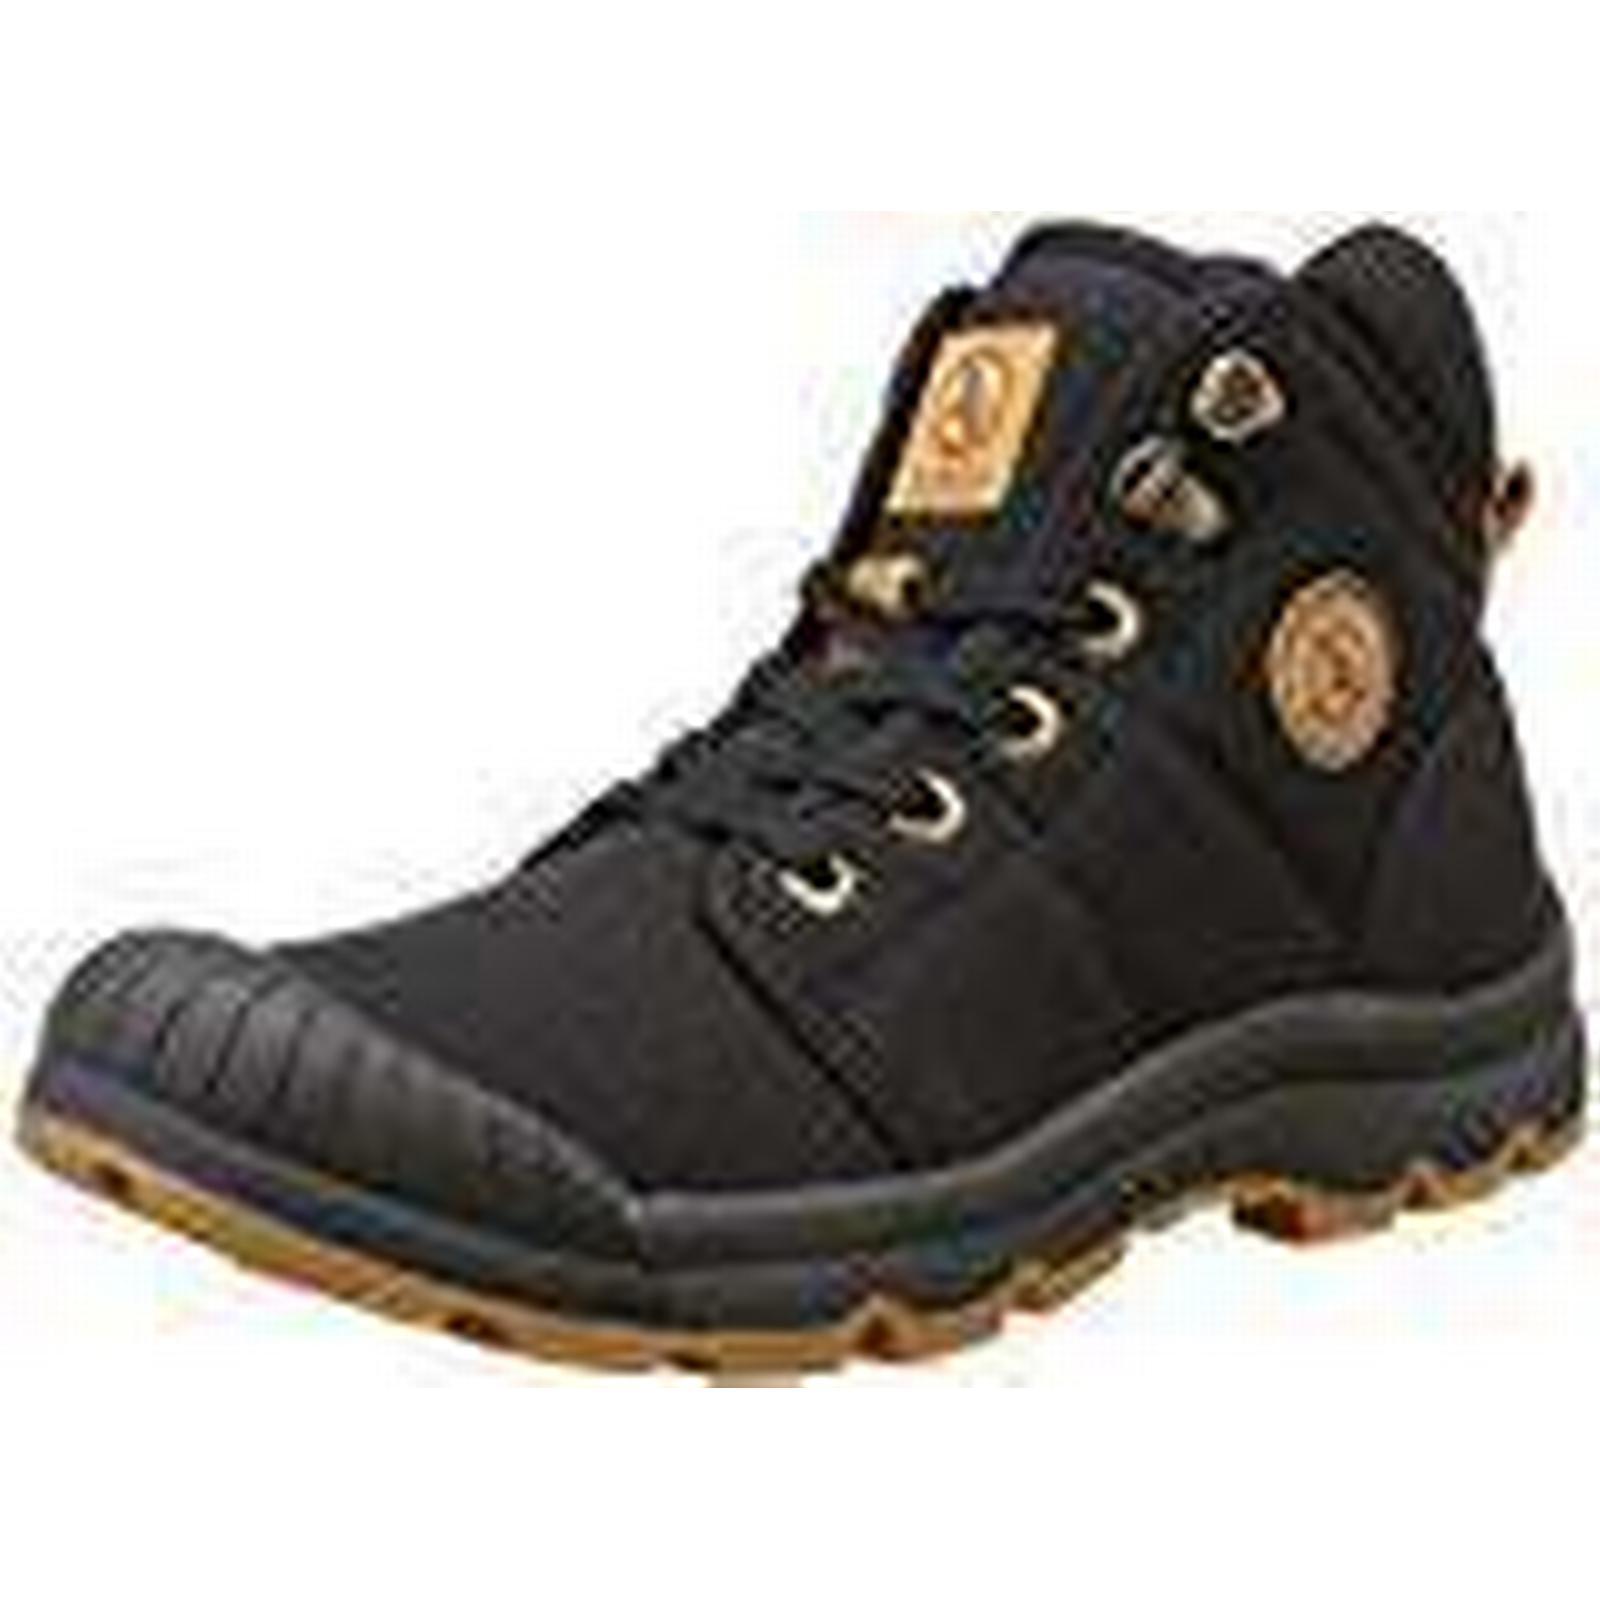 Aigle Shoes, Men's Tenere Light High Rise Hiking Shoes, Aigle Black (Black), 9 UK a09722